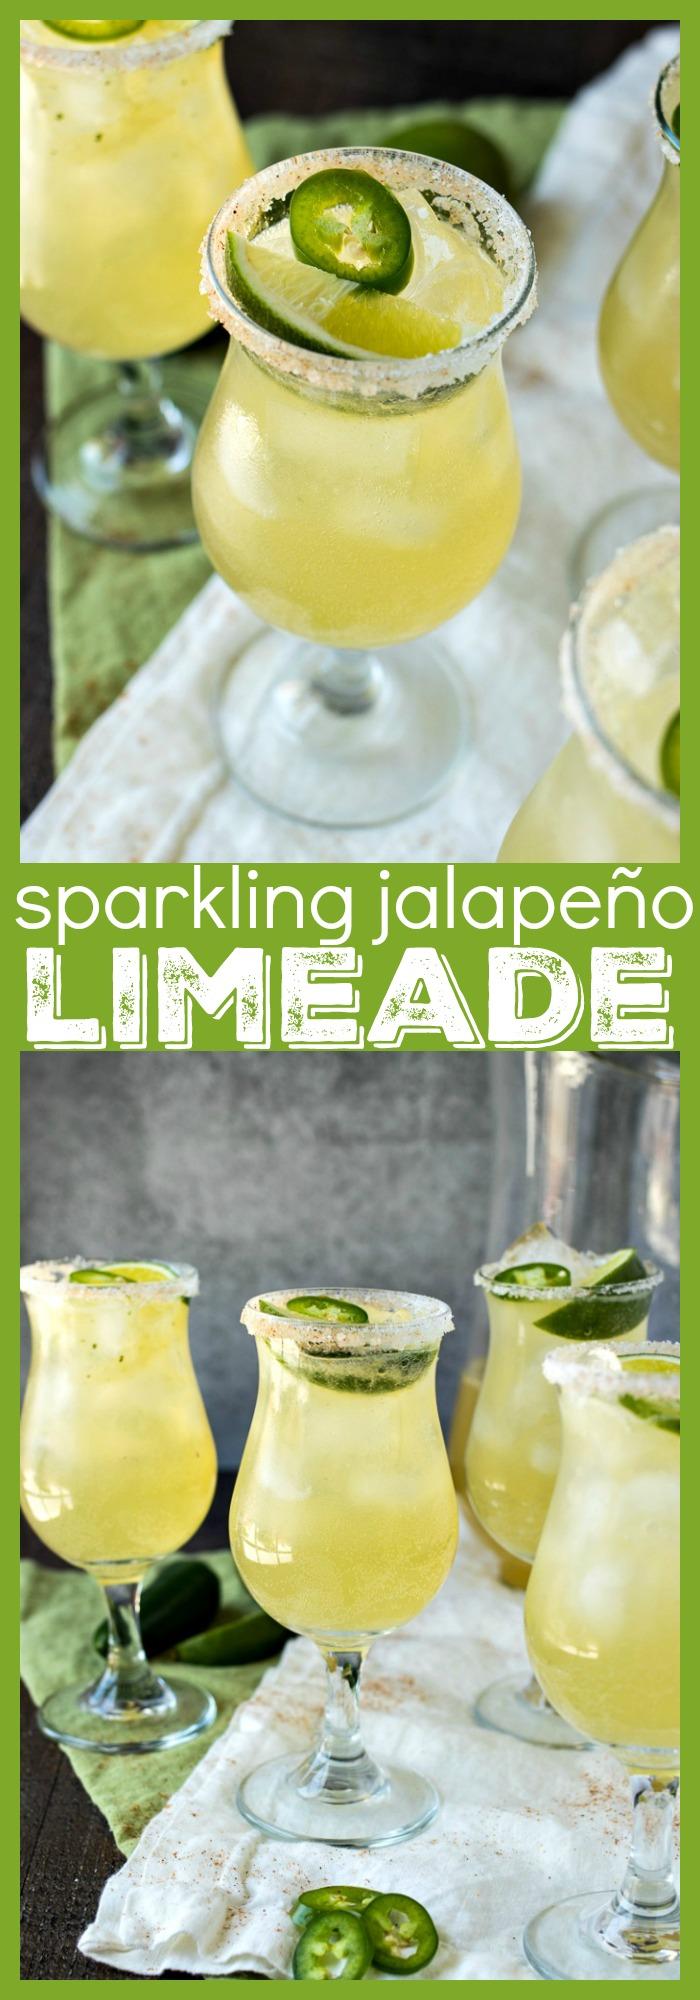 Sparkling Jalapeño Limeade photo collage